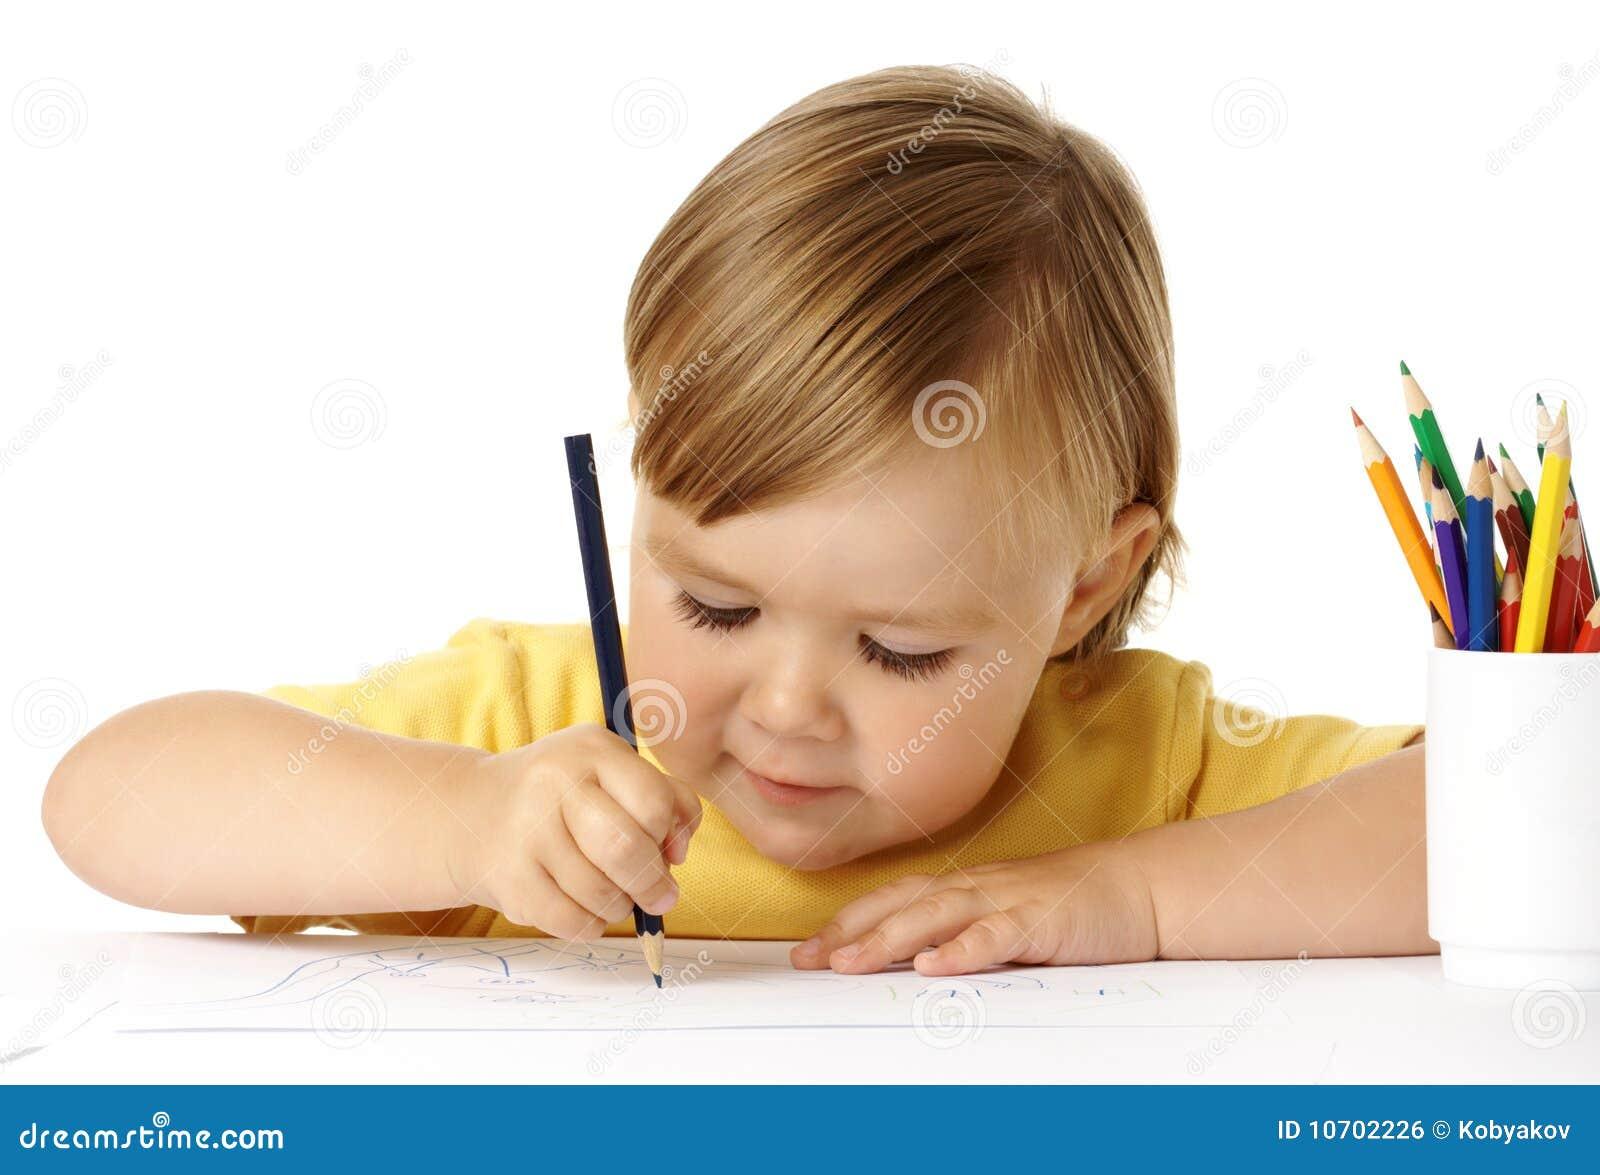 Draw för barnfärgcrayons